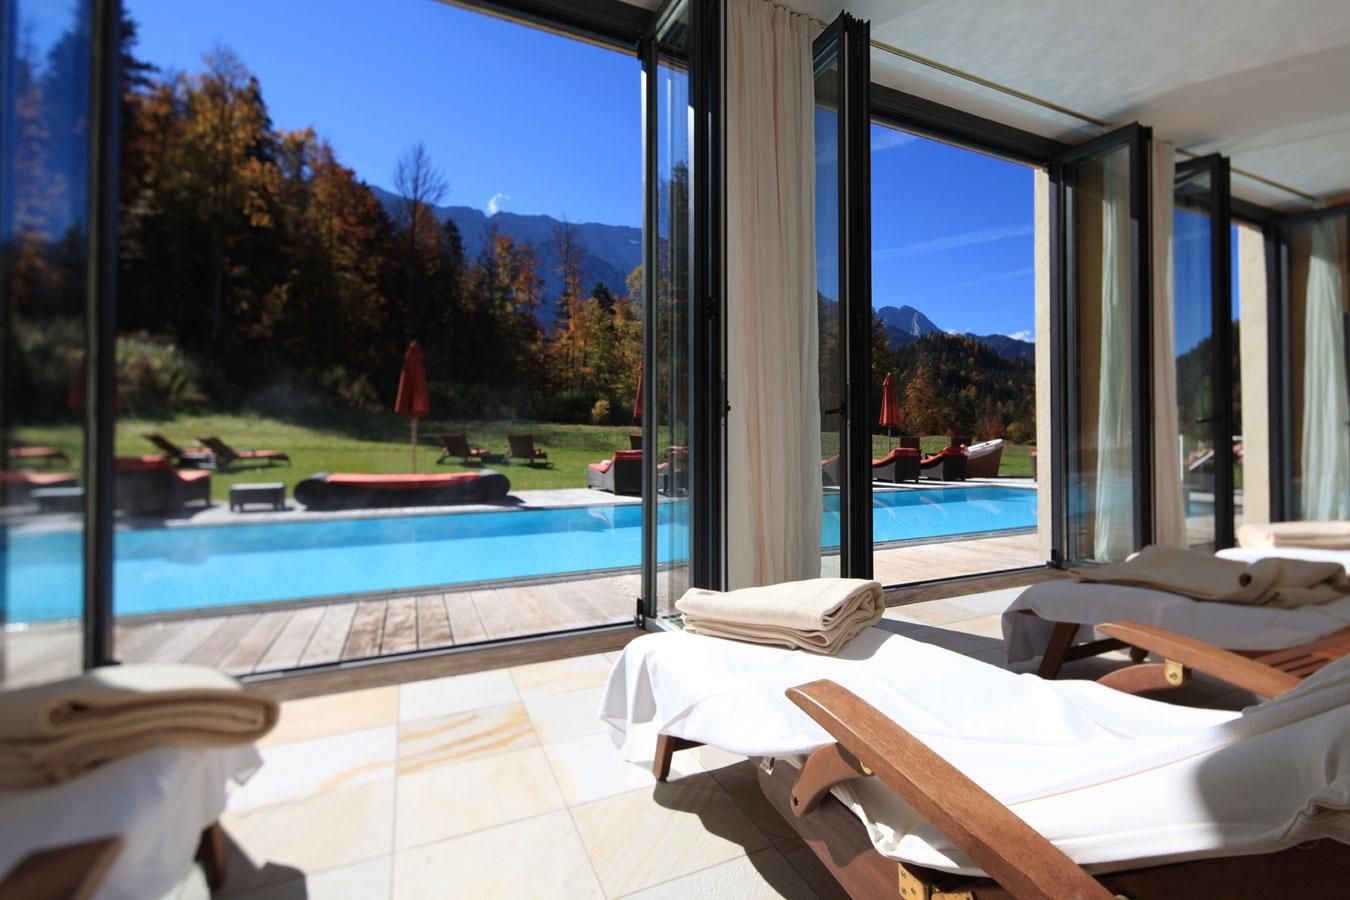 Hotel Schloss Family Spa